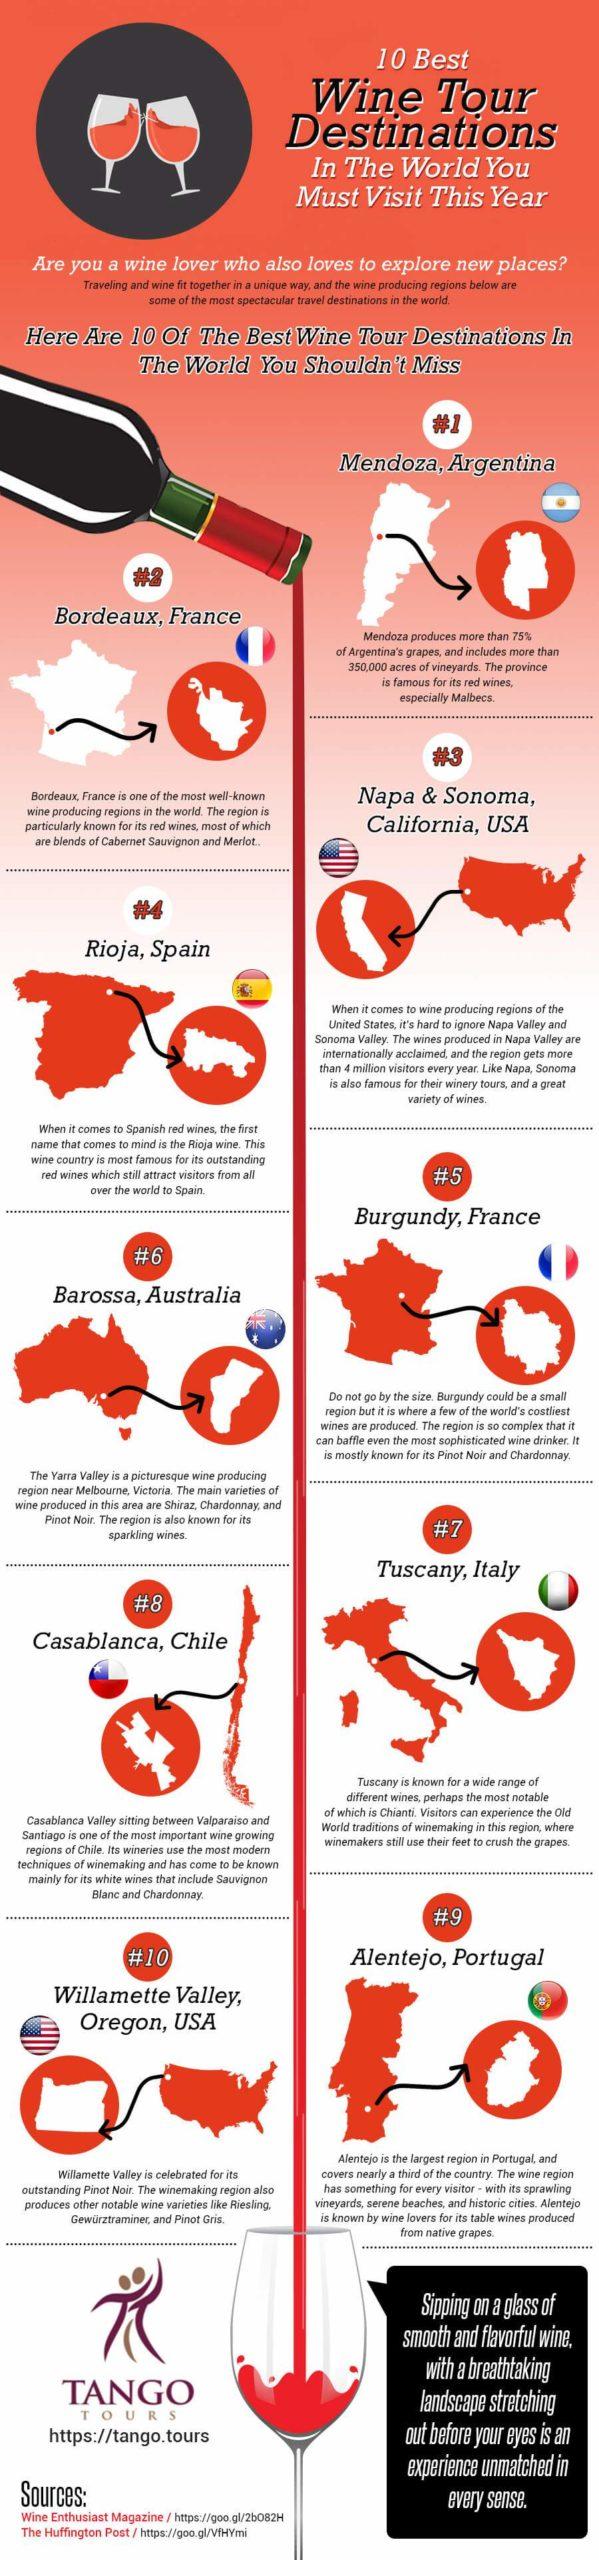 Best-Wine-Tour-Destinations-In-The-World